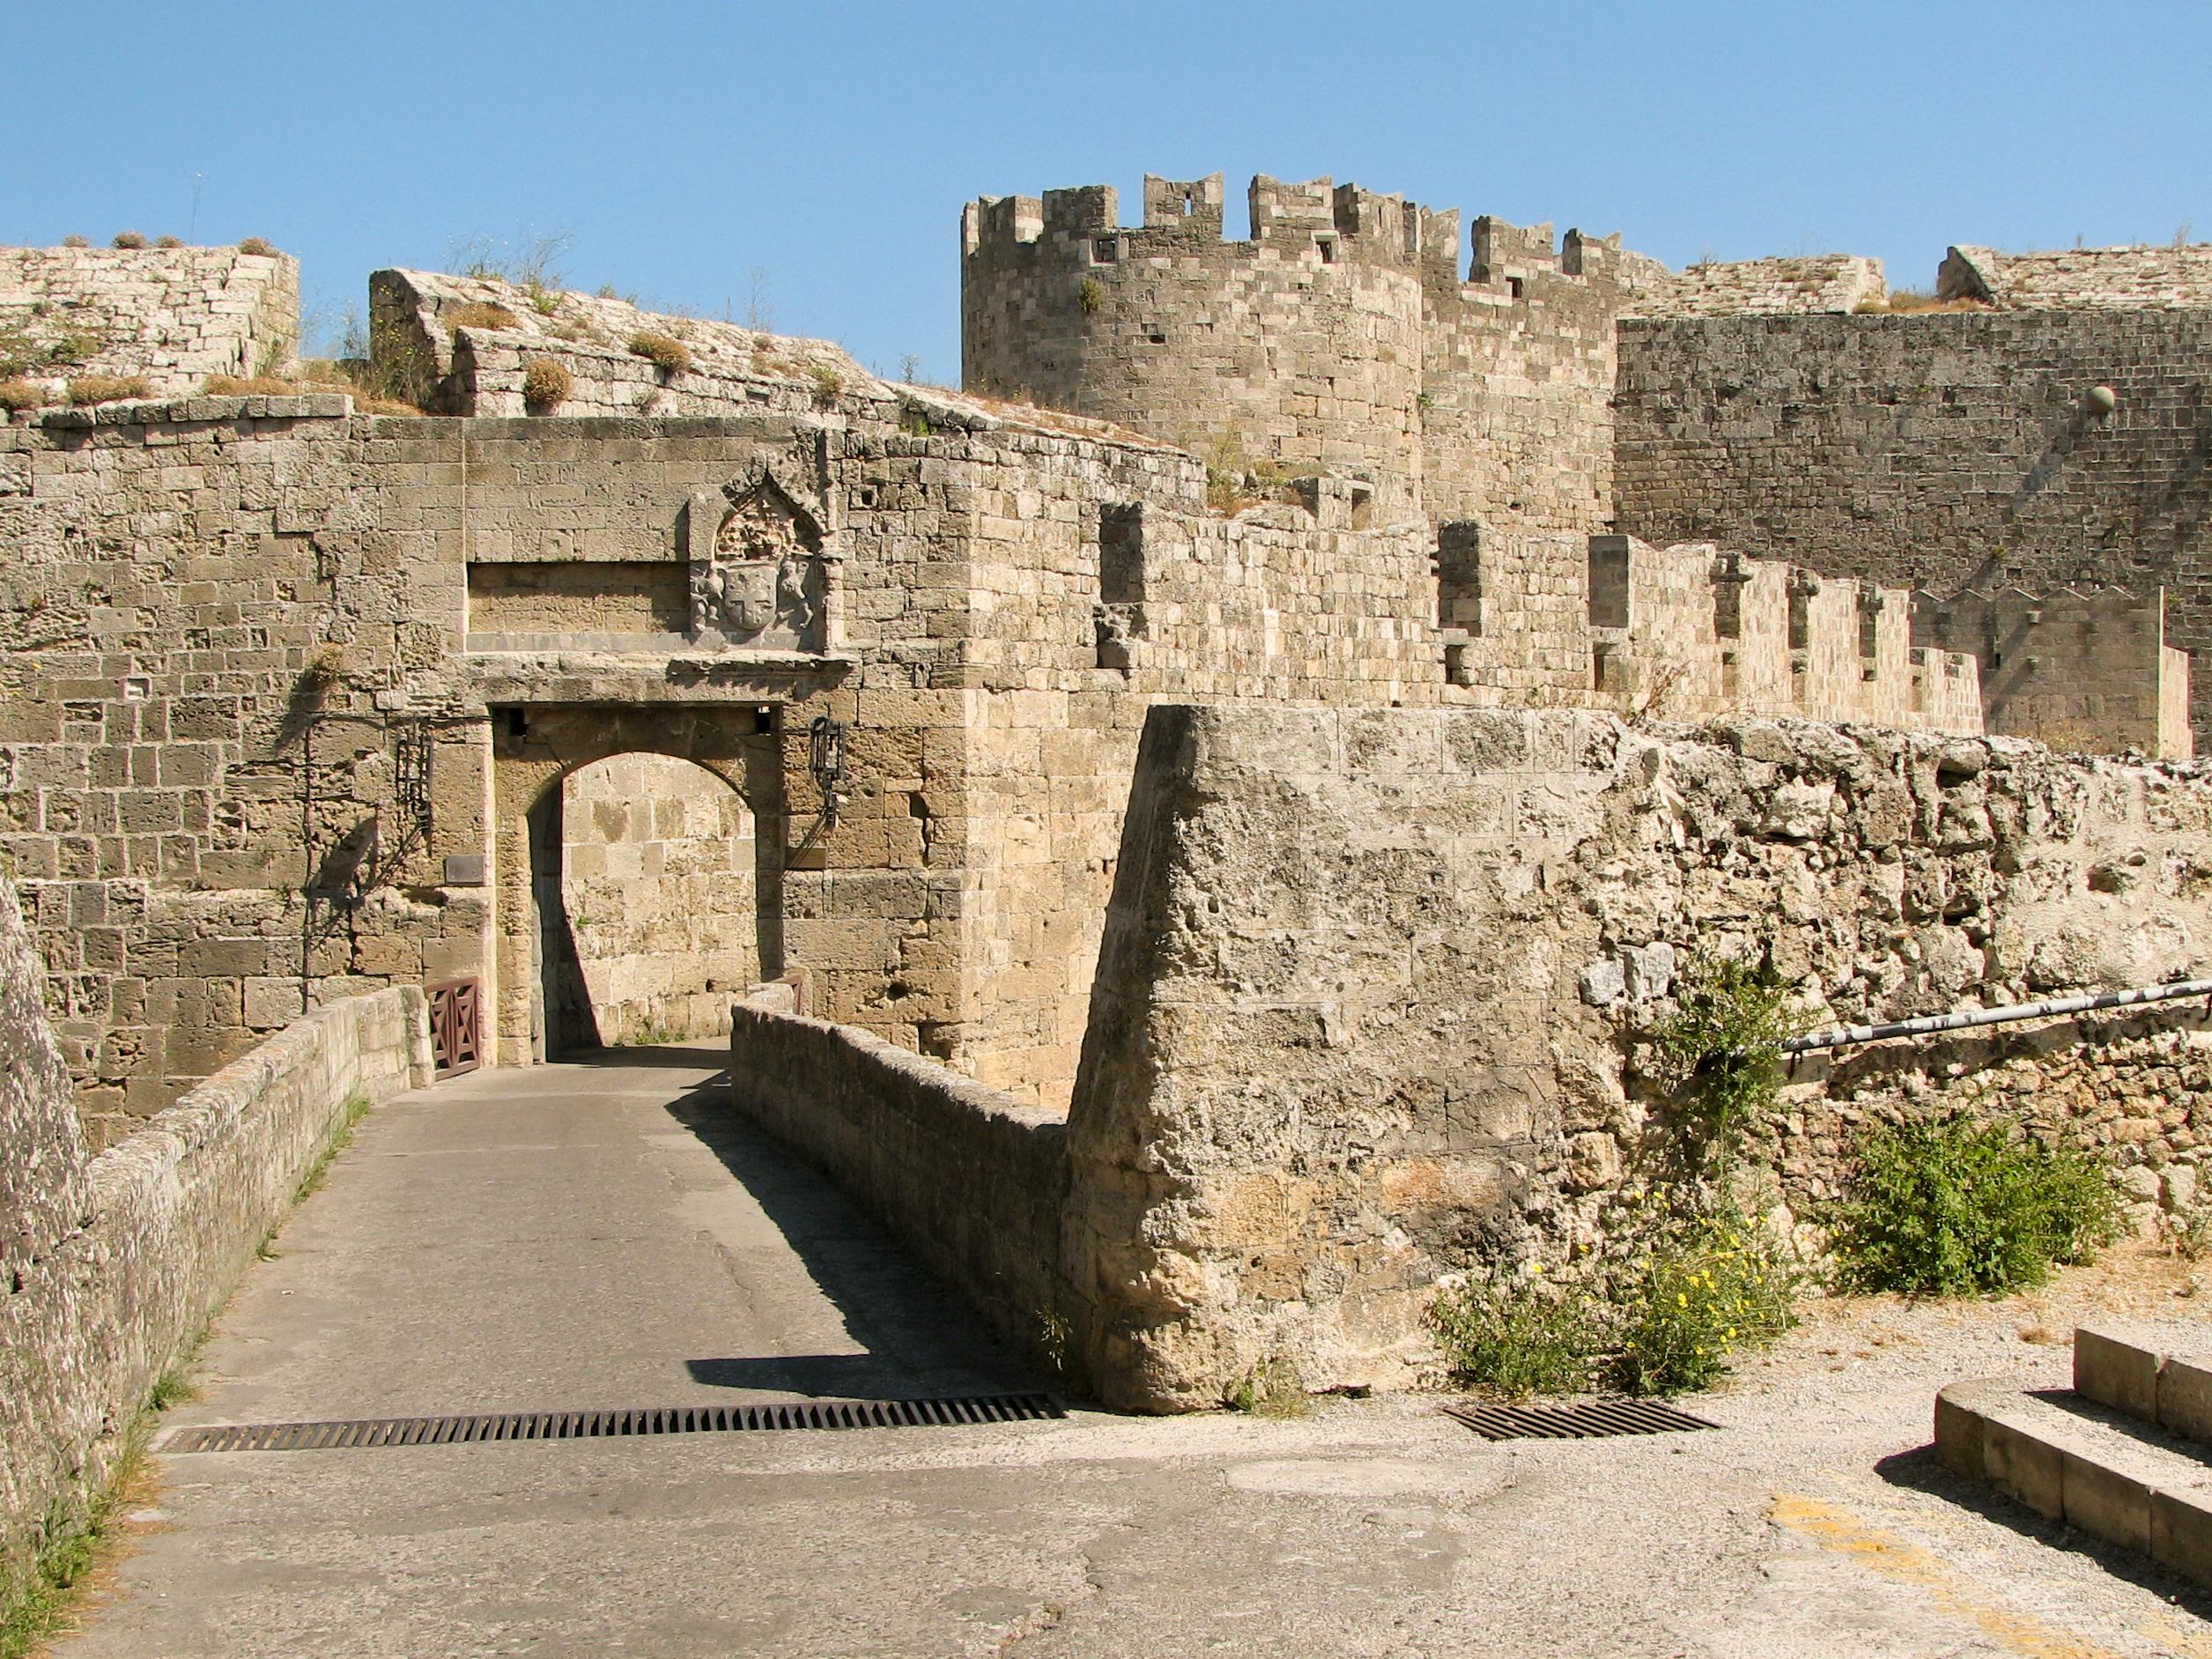 File:Rhodes old town Greece 1.jpg